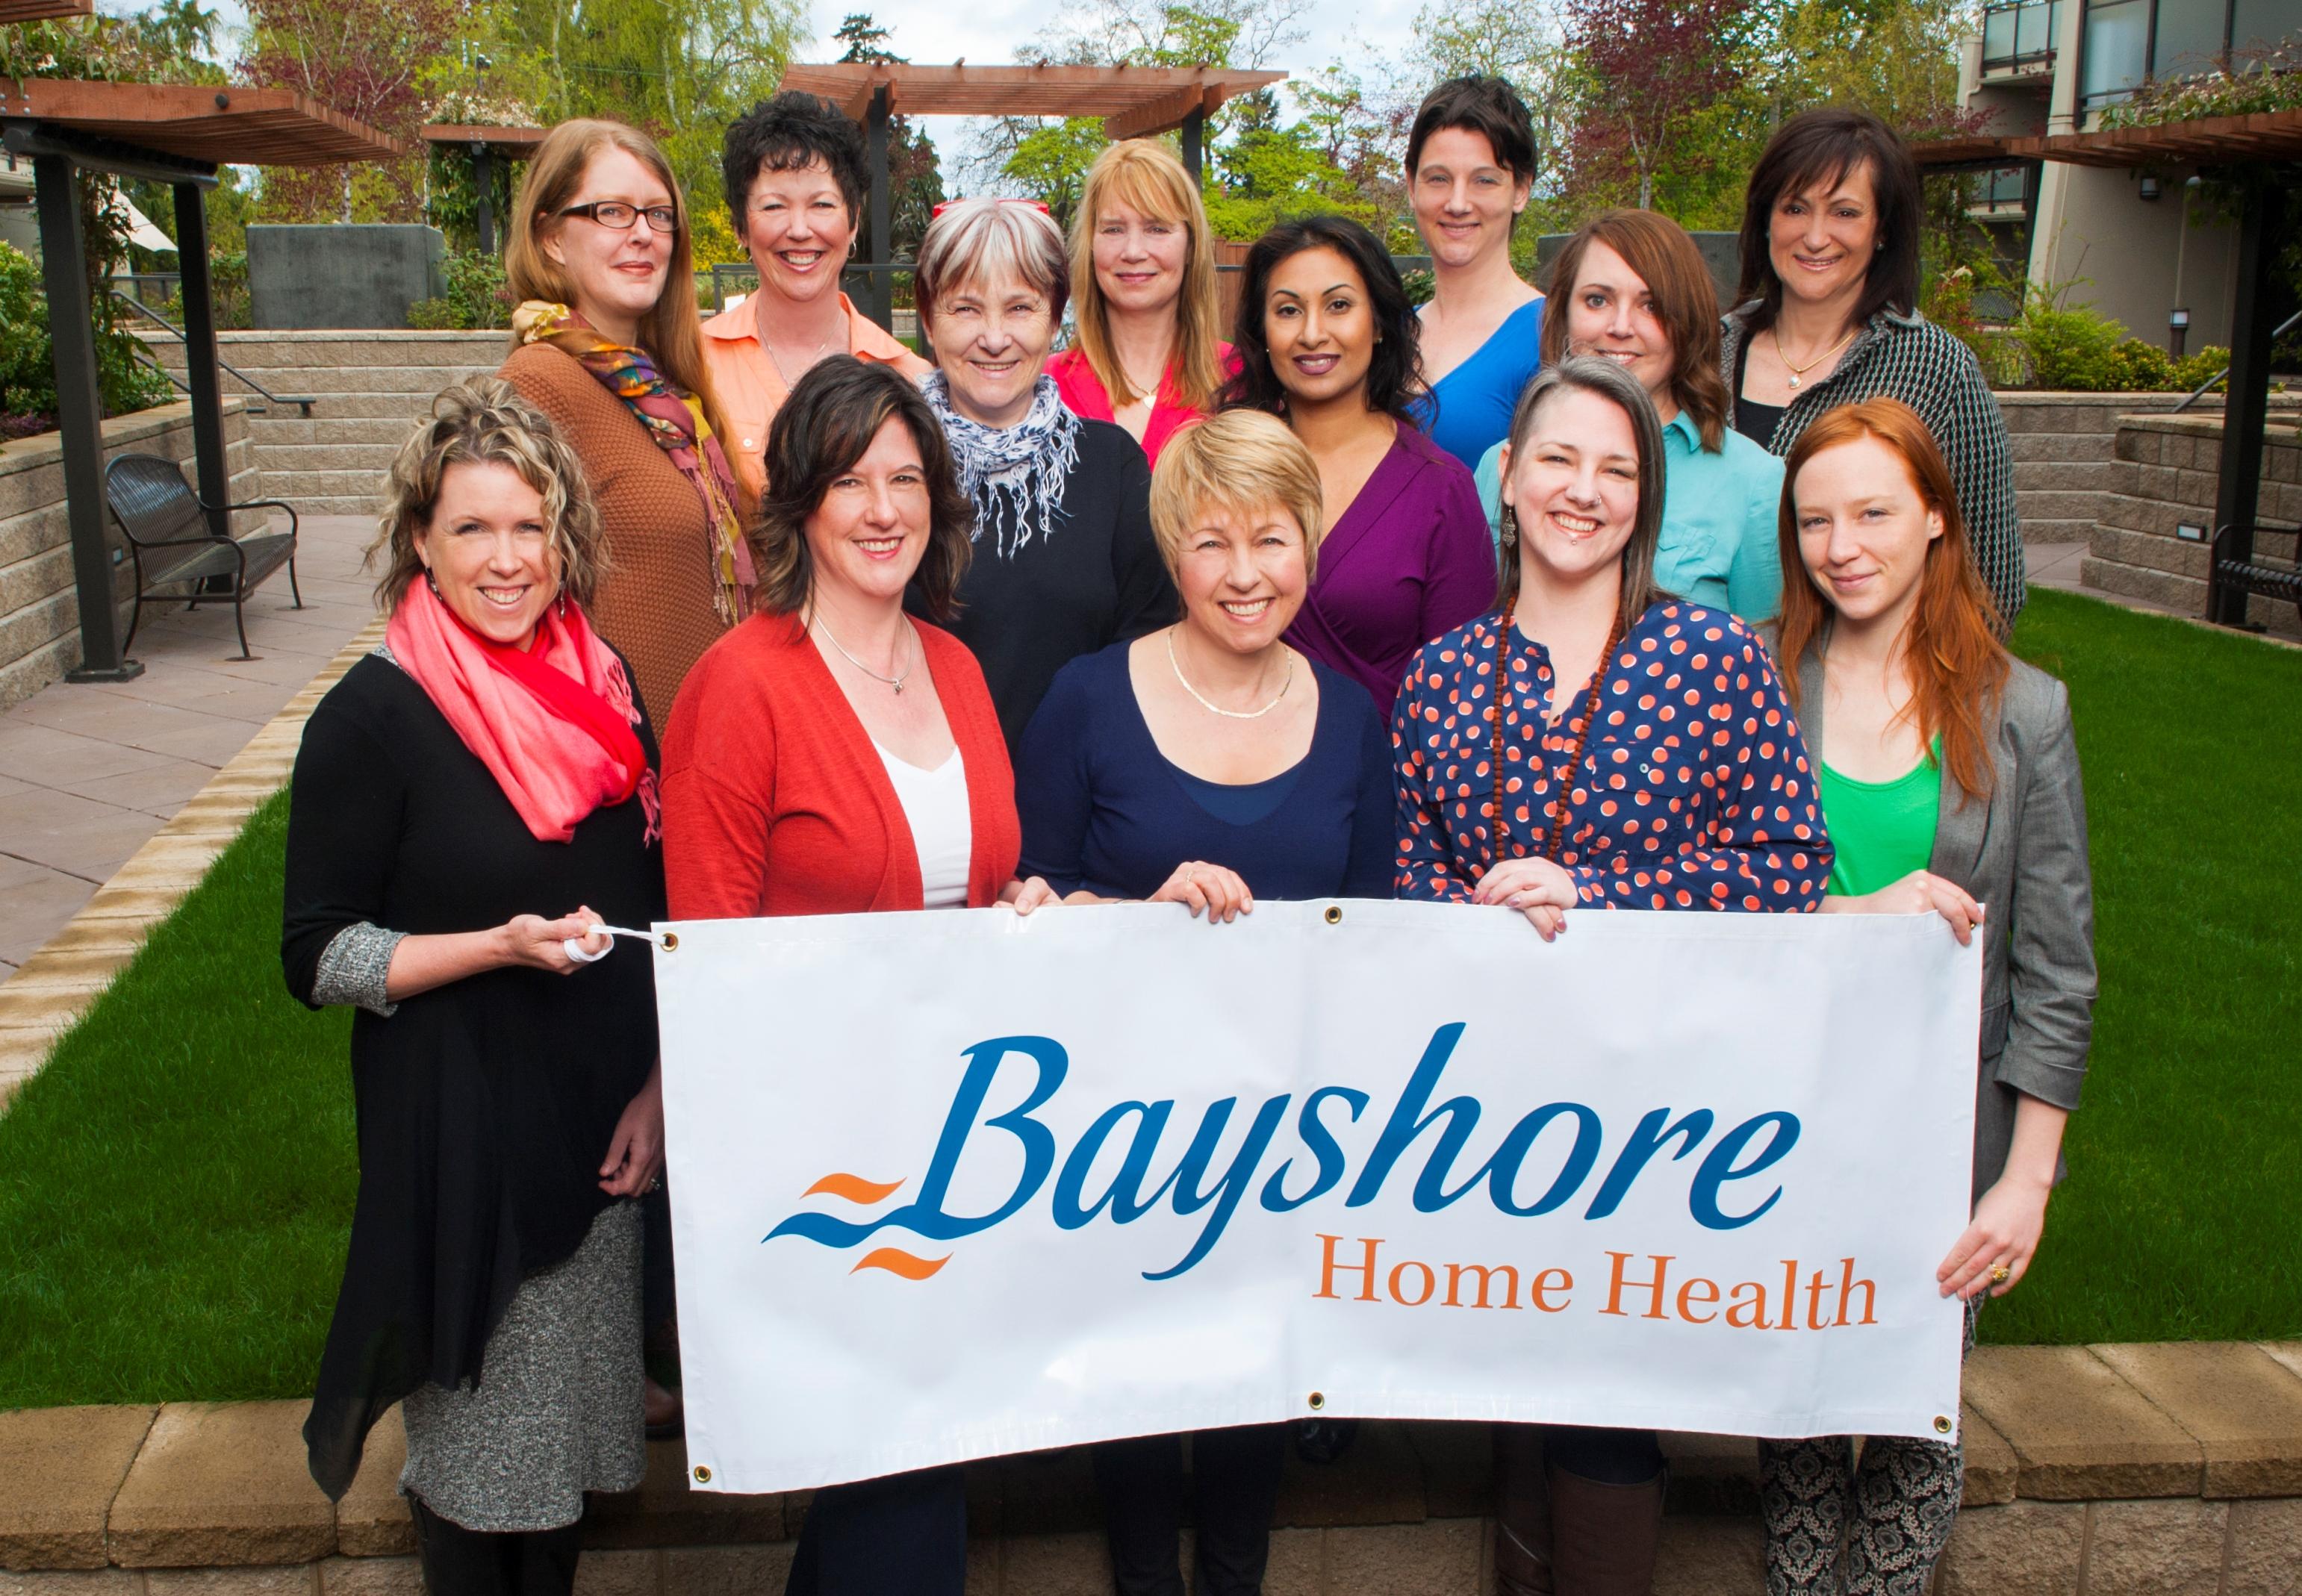 Bayshore Home Health Victoria team